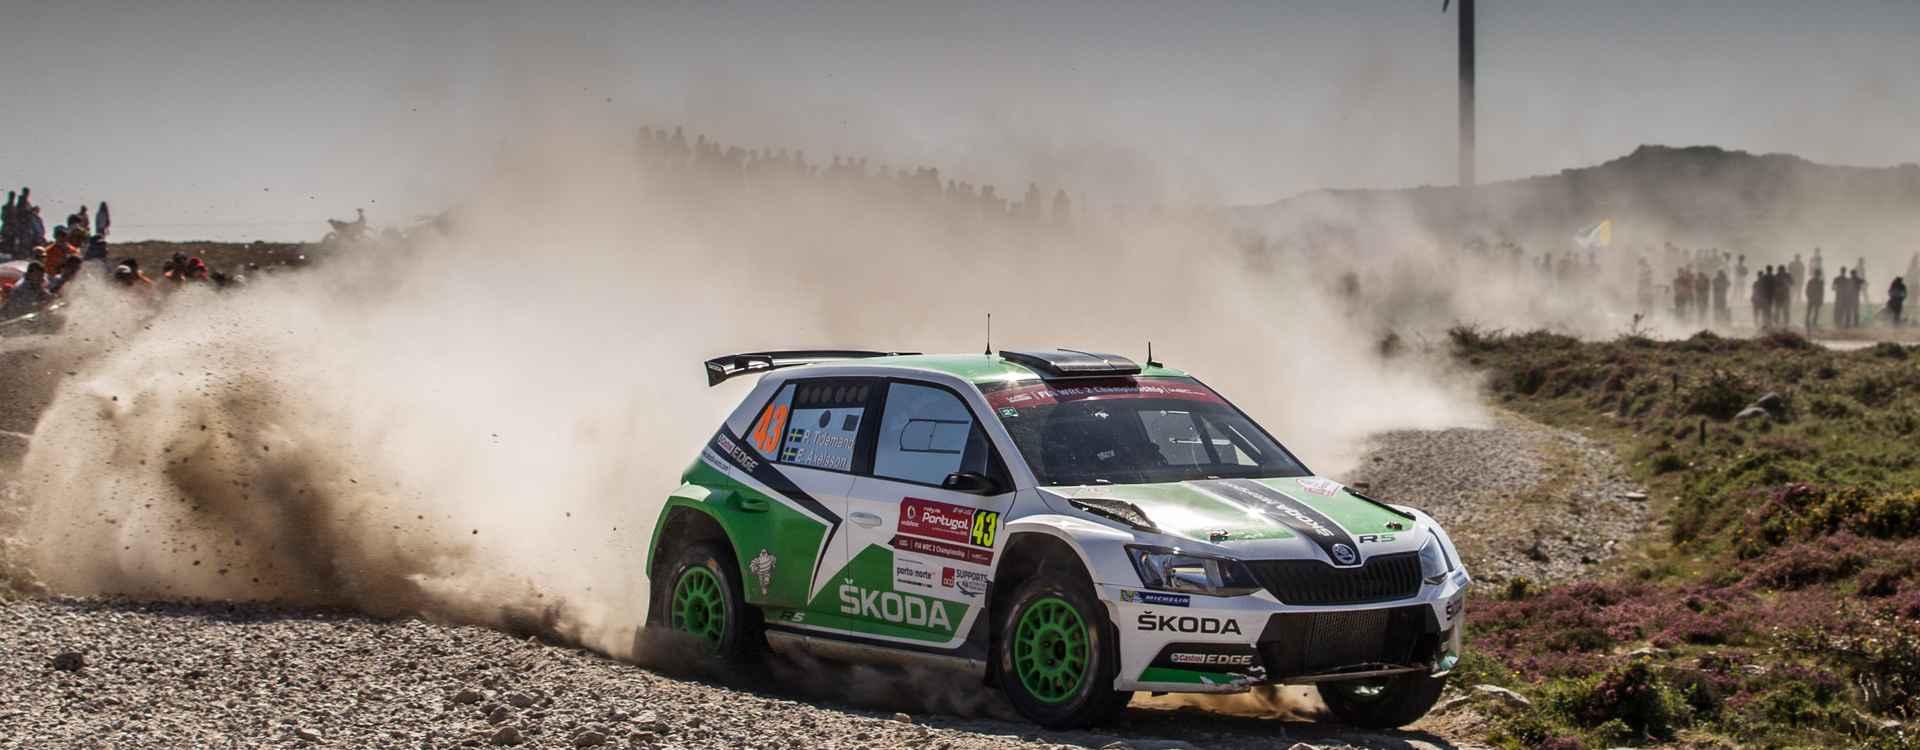 World Rally Championship (WRC 2)